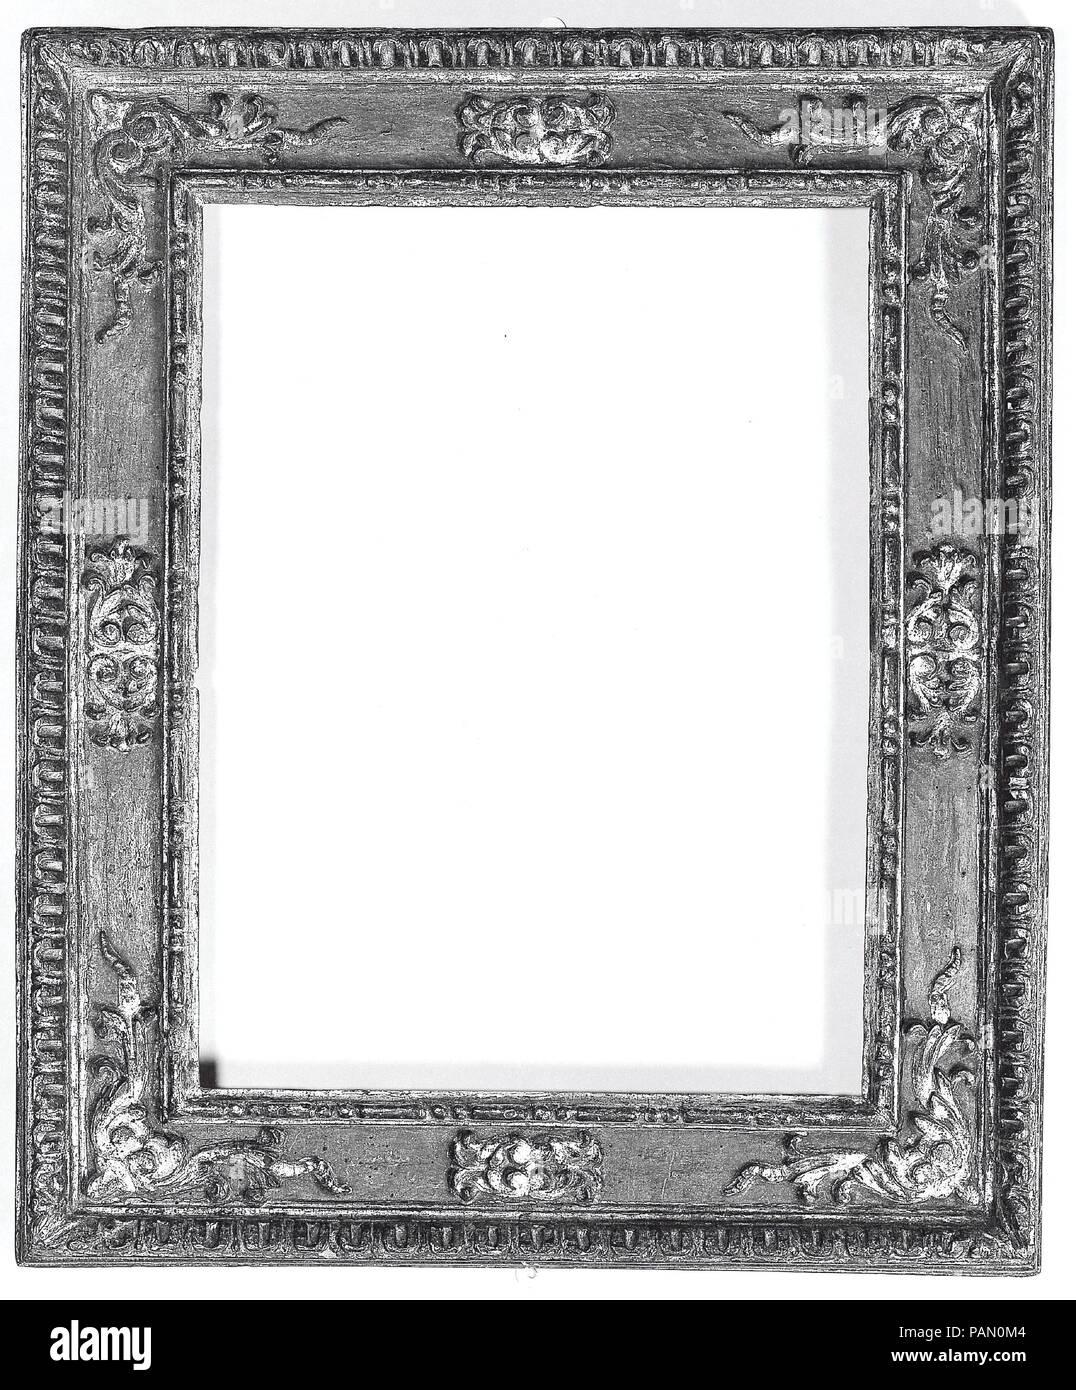 Cassetta Frame Culture Italian Tuscany Dimensions Overall 27 X